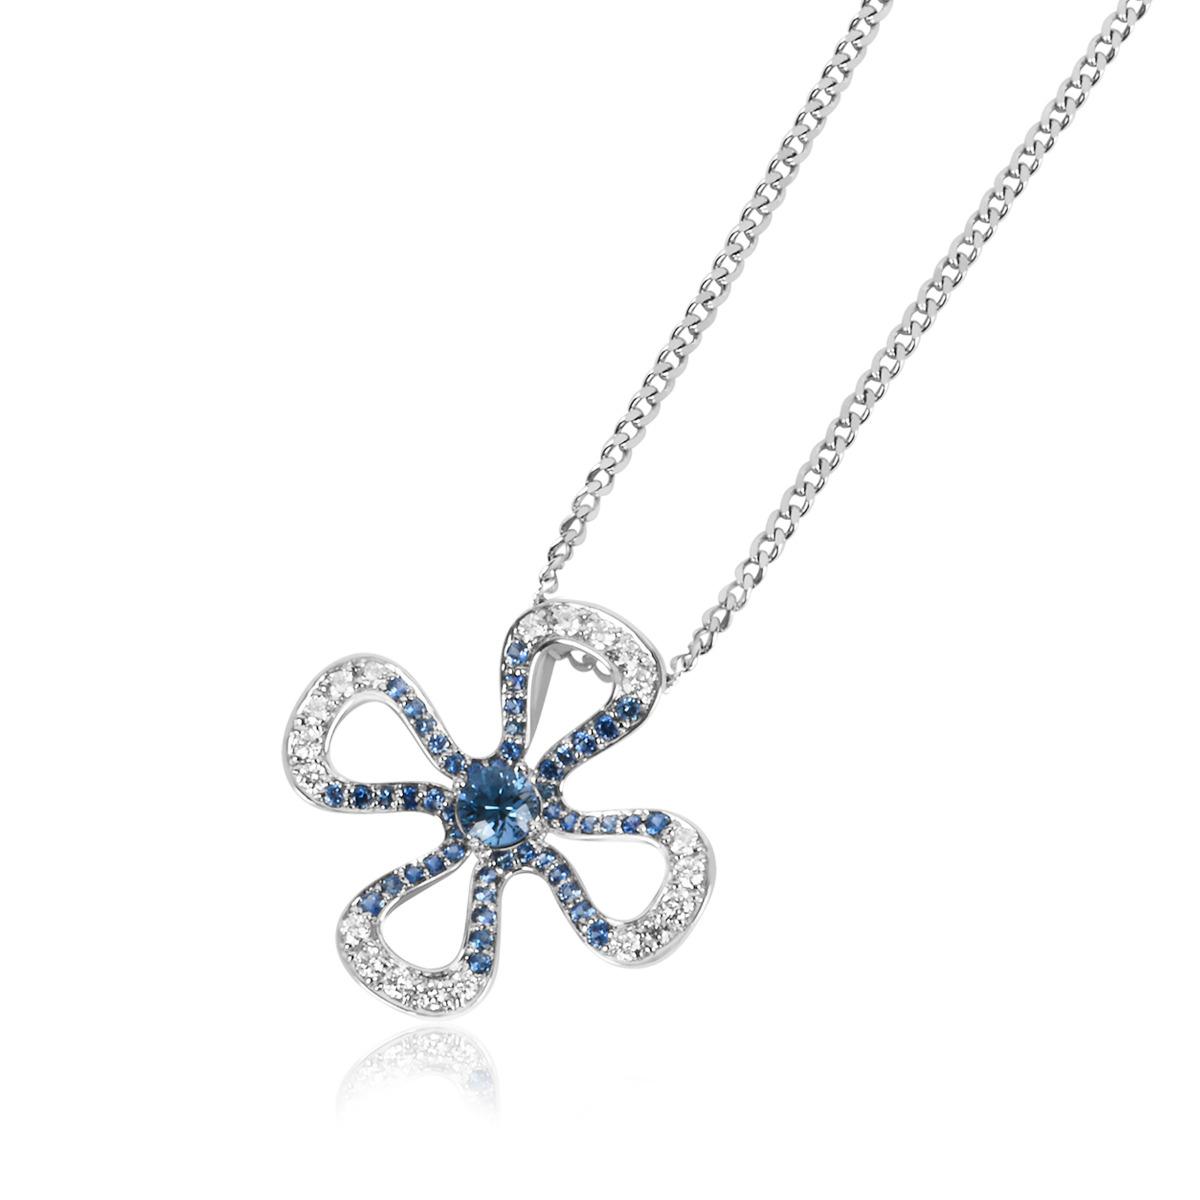 18ct White Gold Iolite, Sapphire and Diamond Pendant